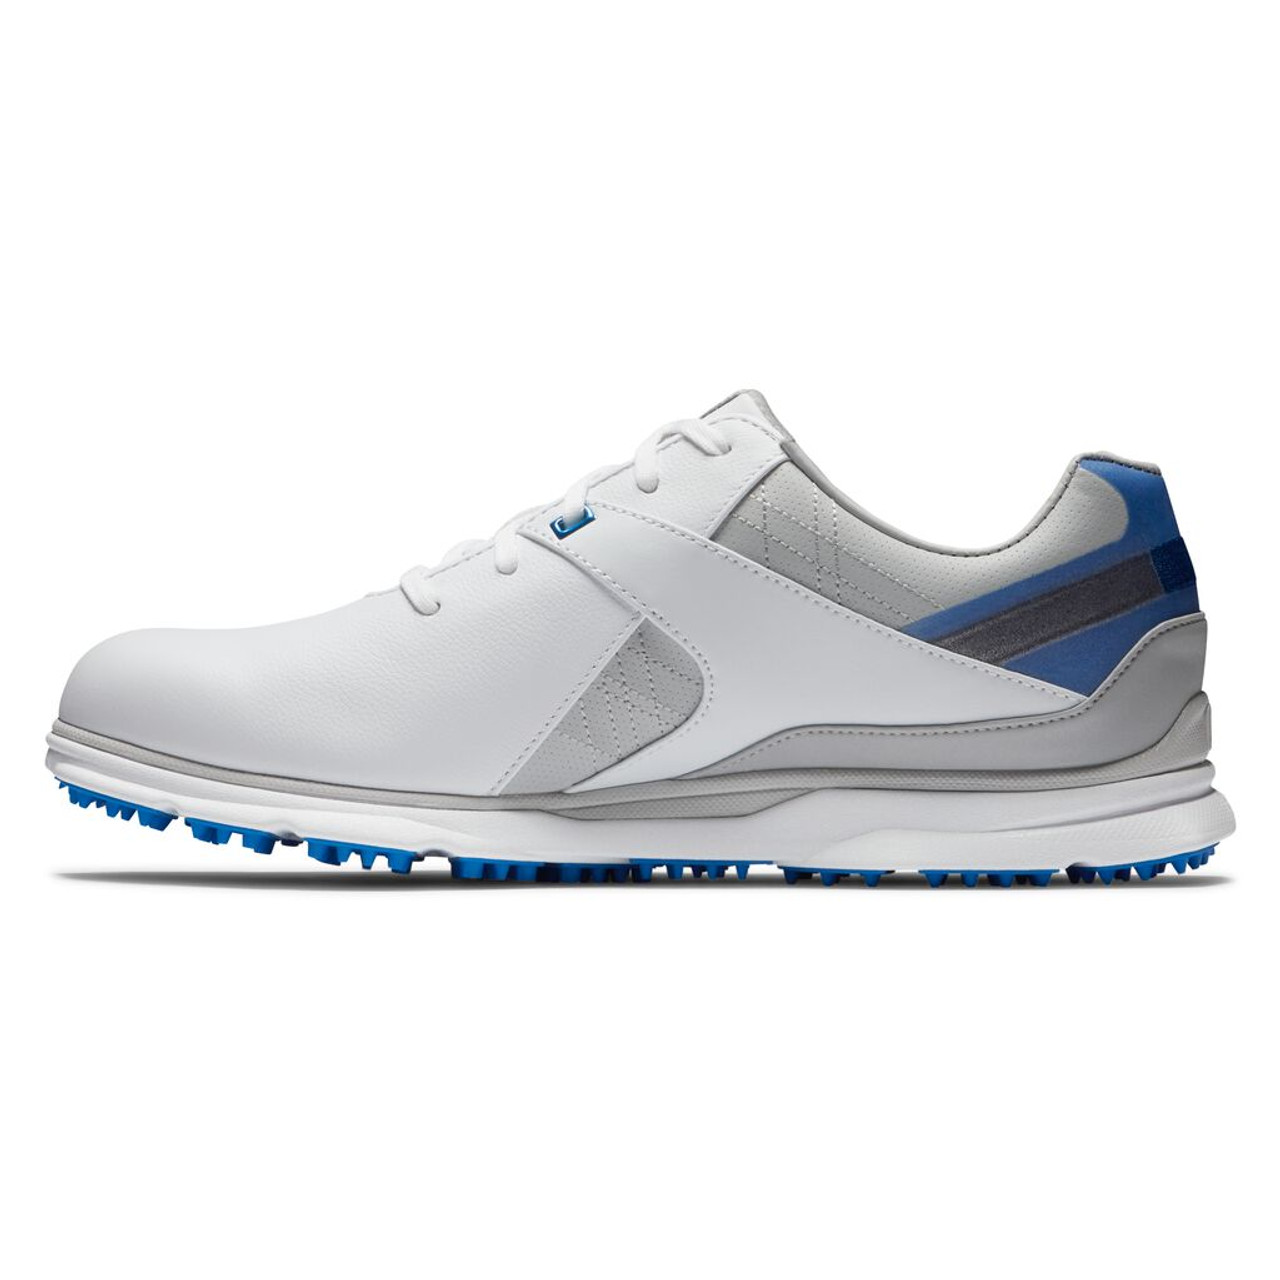 FootJoy Pro SL Golf Shoes - White / Blue / Grey (53811)